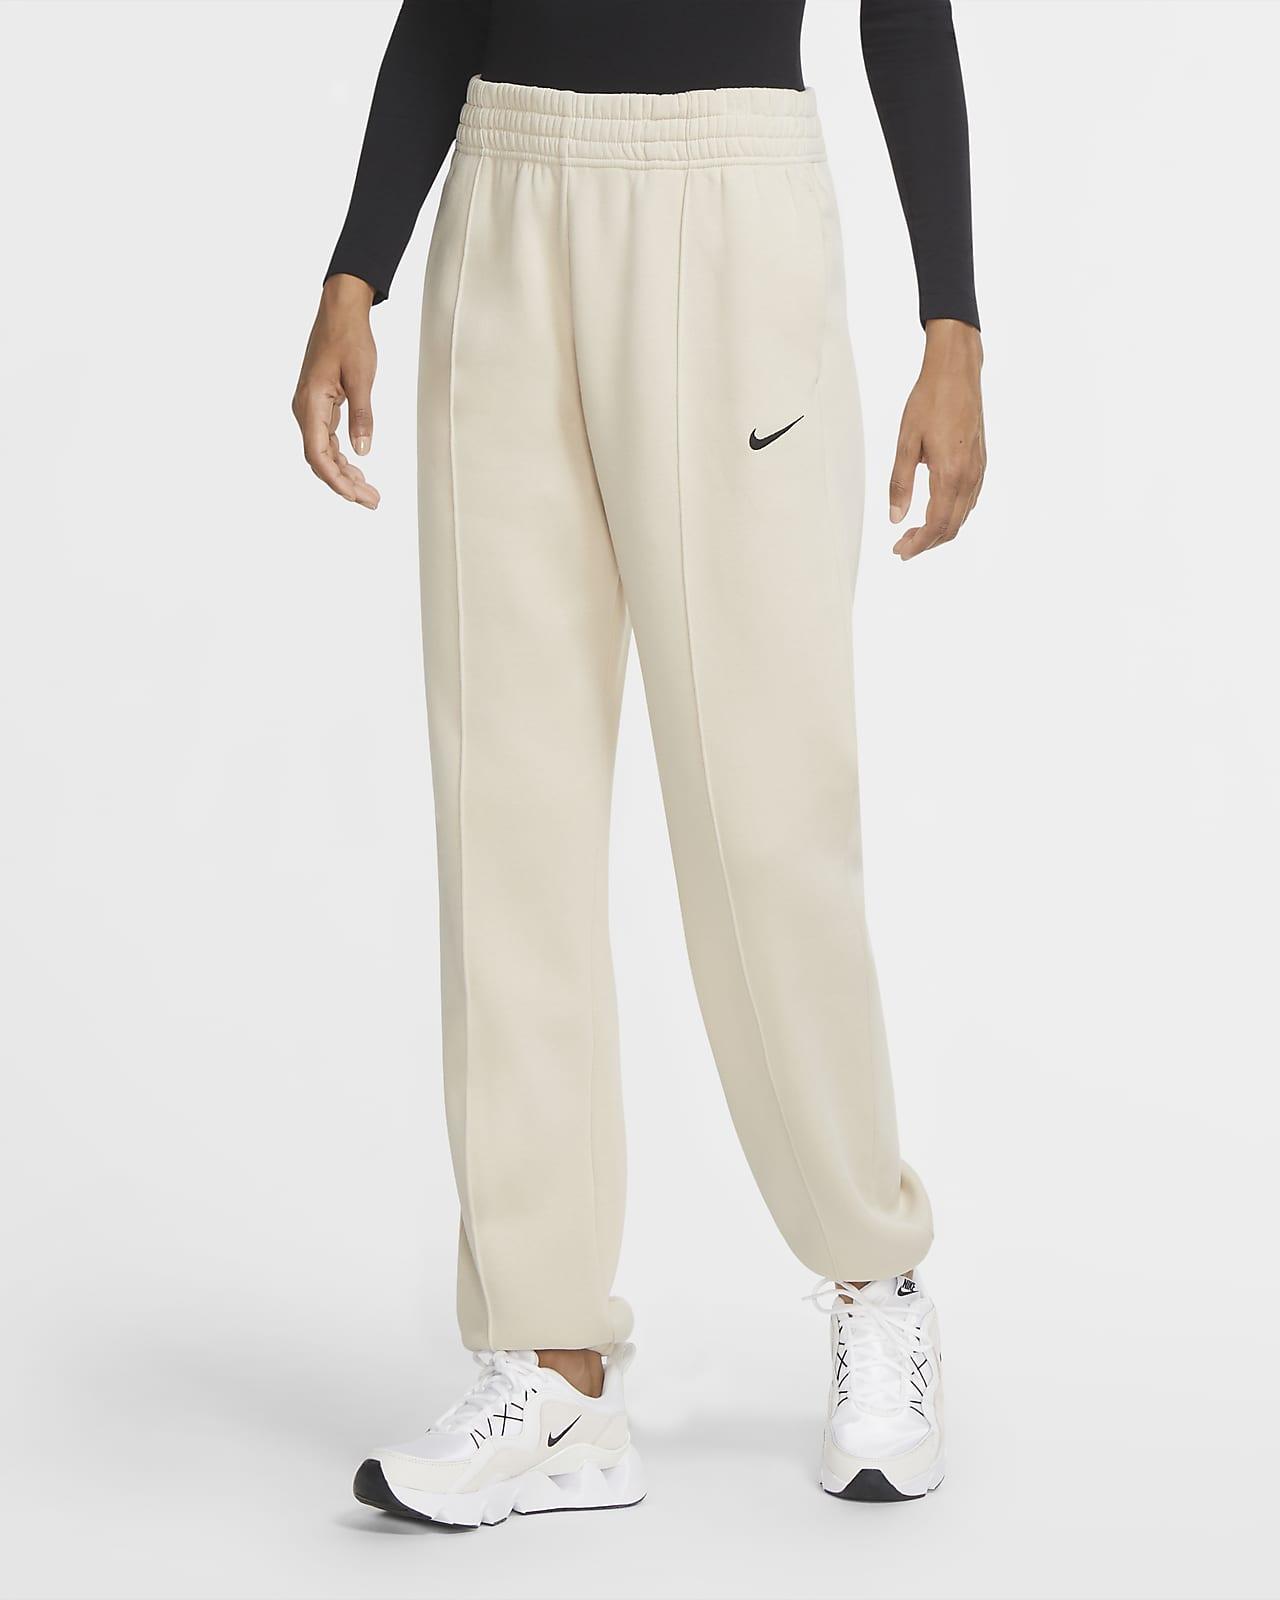 Pantalones de tejido Fleece para mujer Nike Sportswear Essential